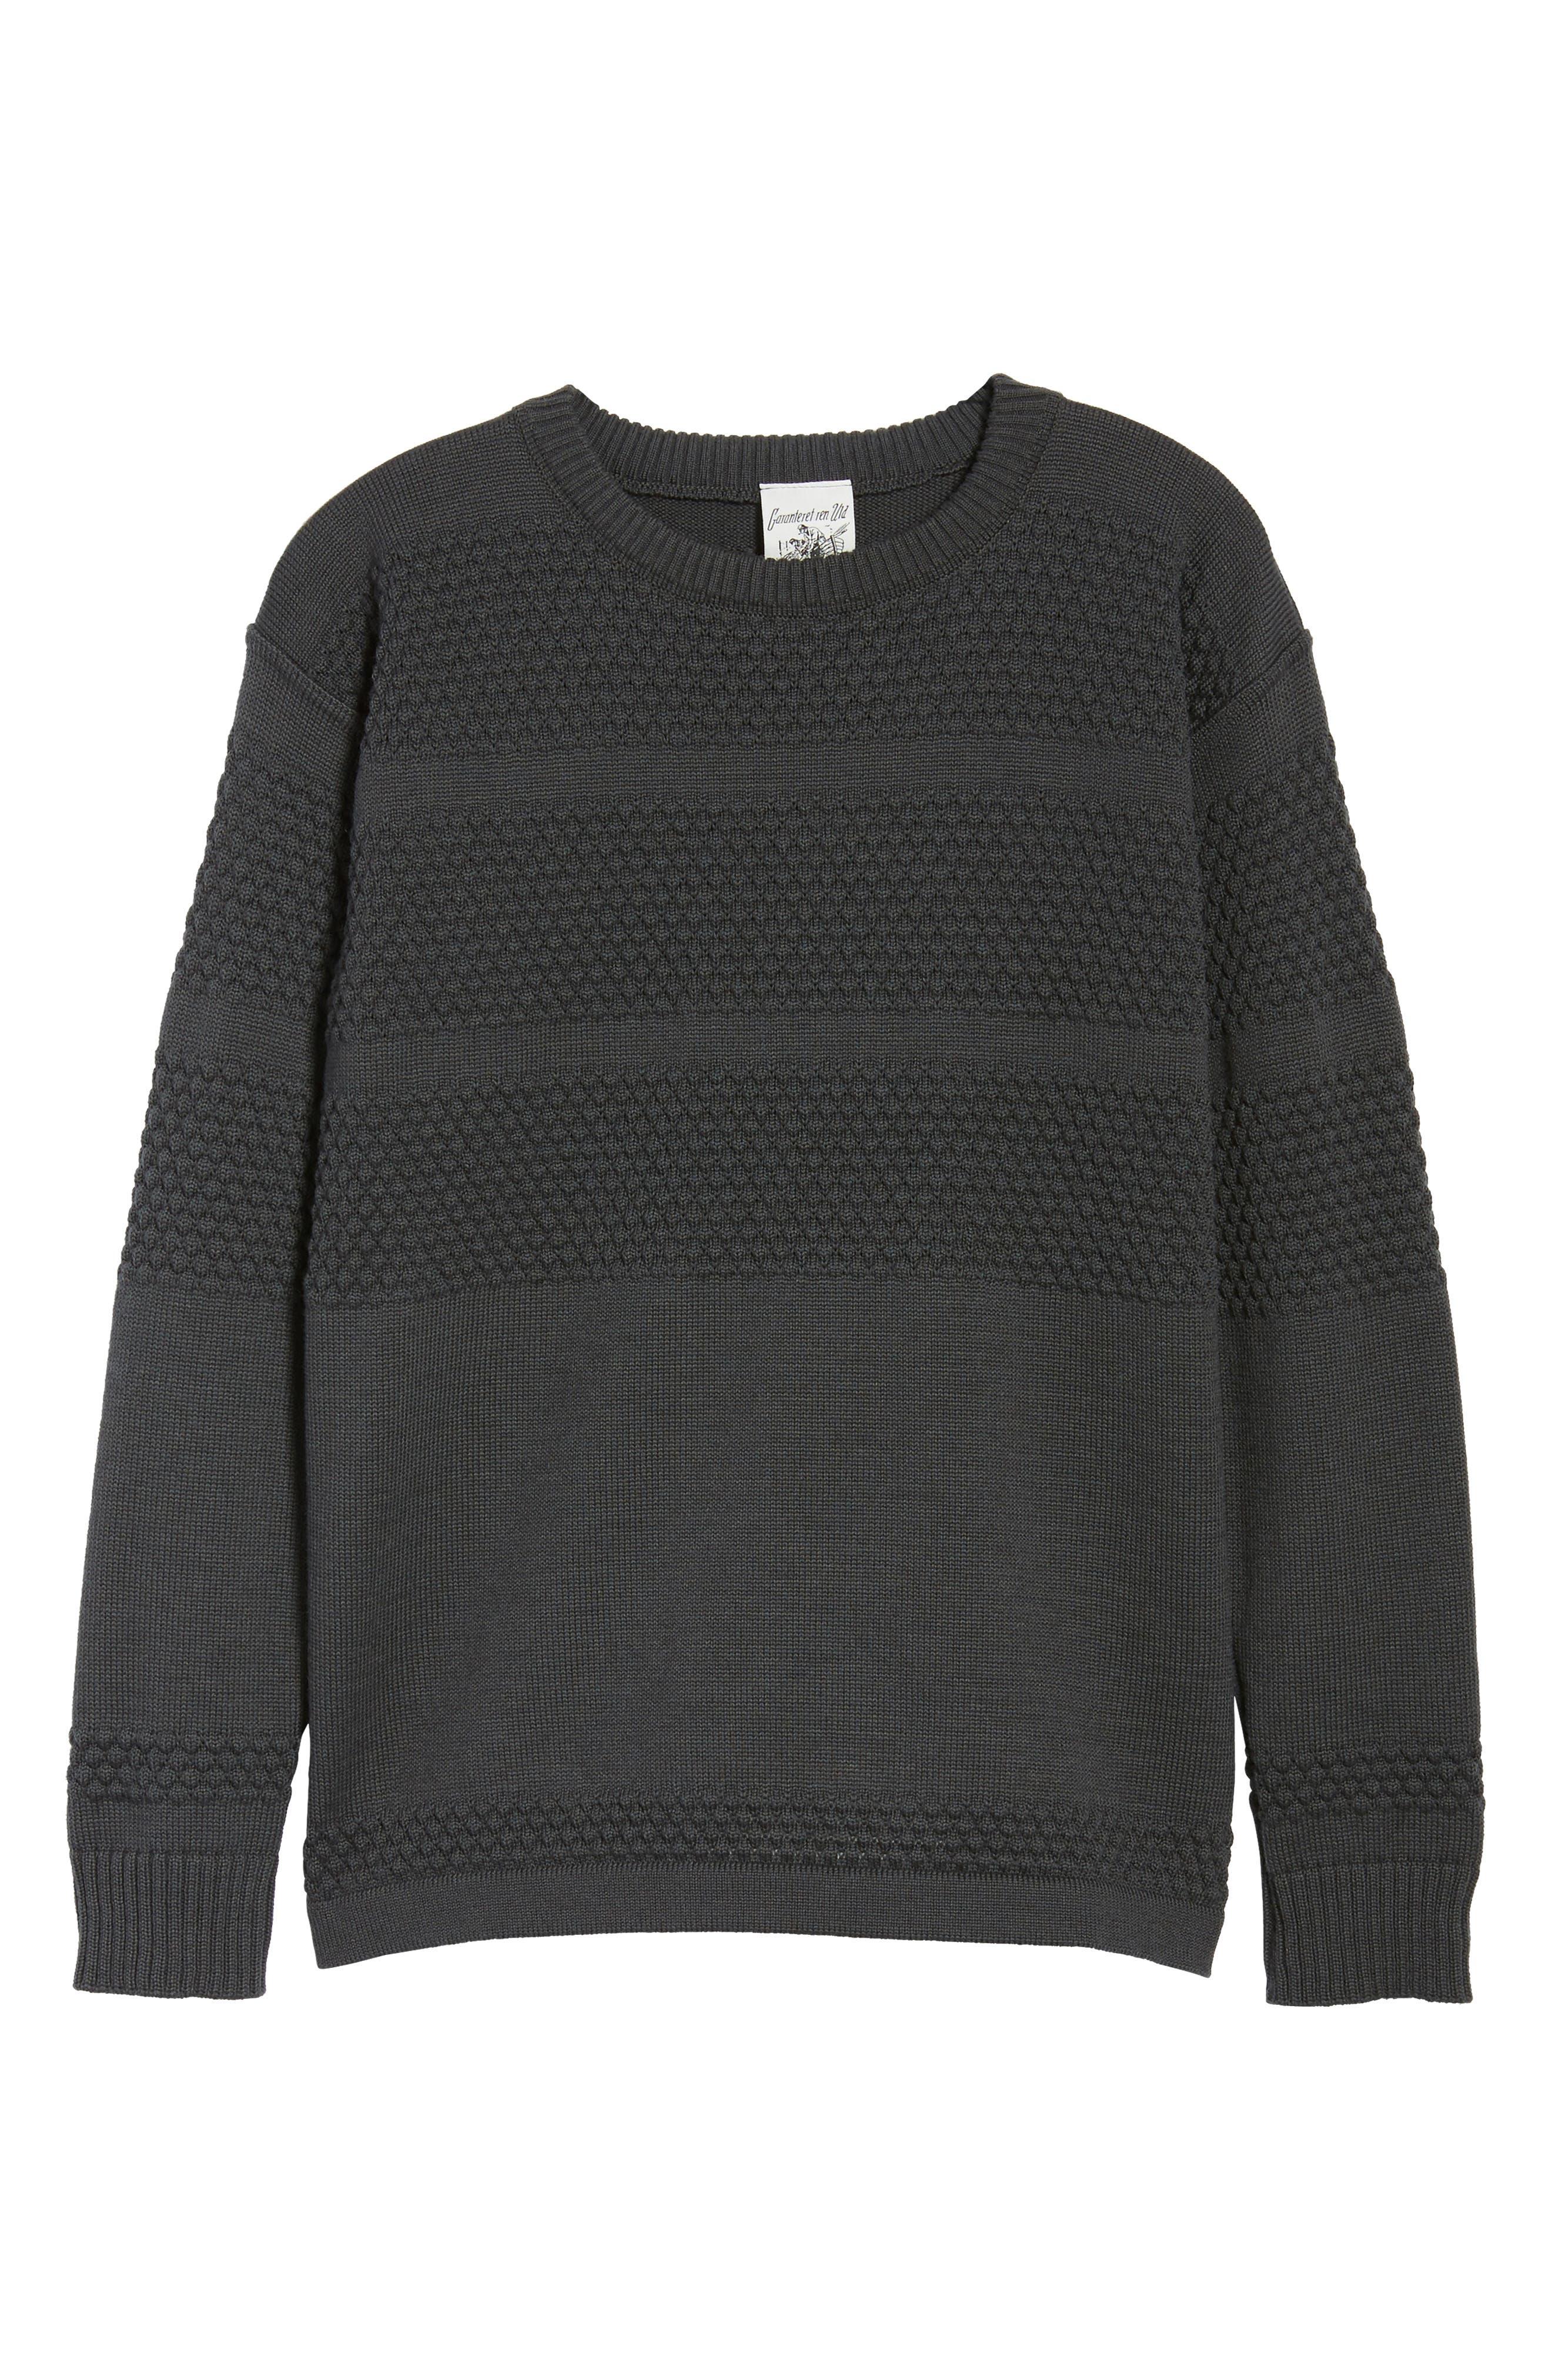 Fisherman Crewneck Wool Sweater,                             Alternate thumbnail 6, color,                             020